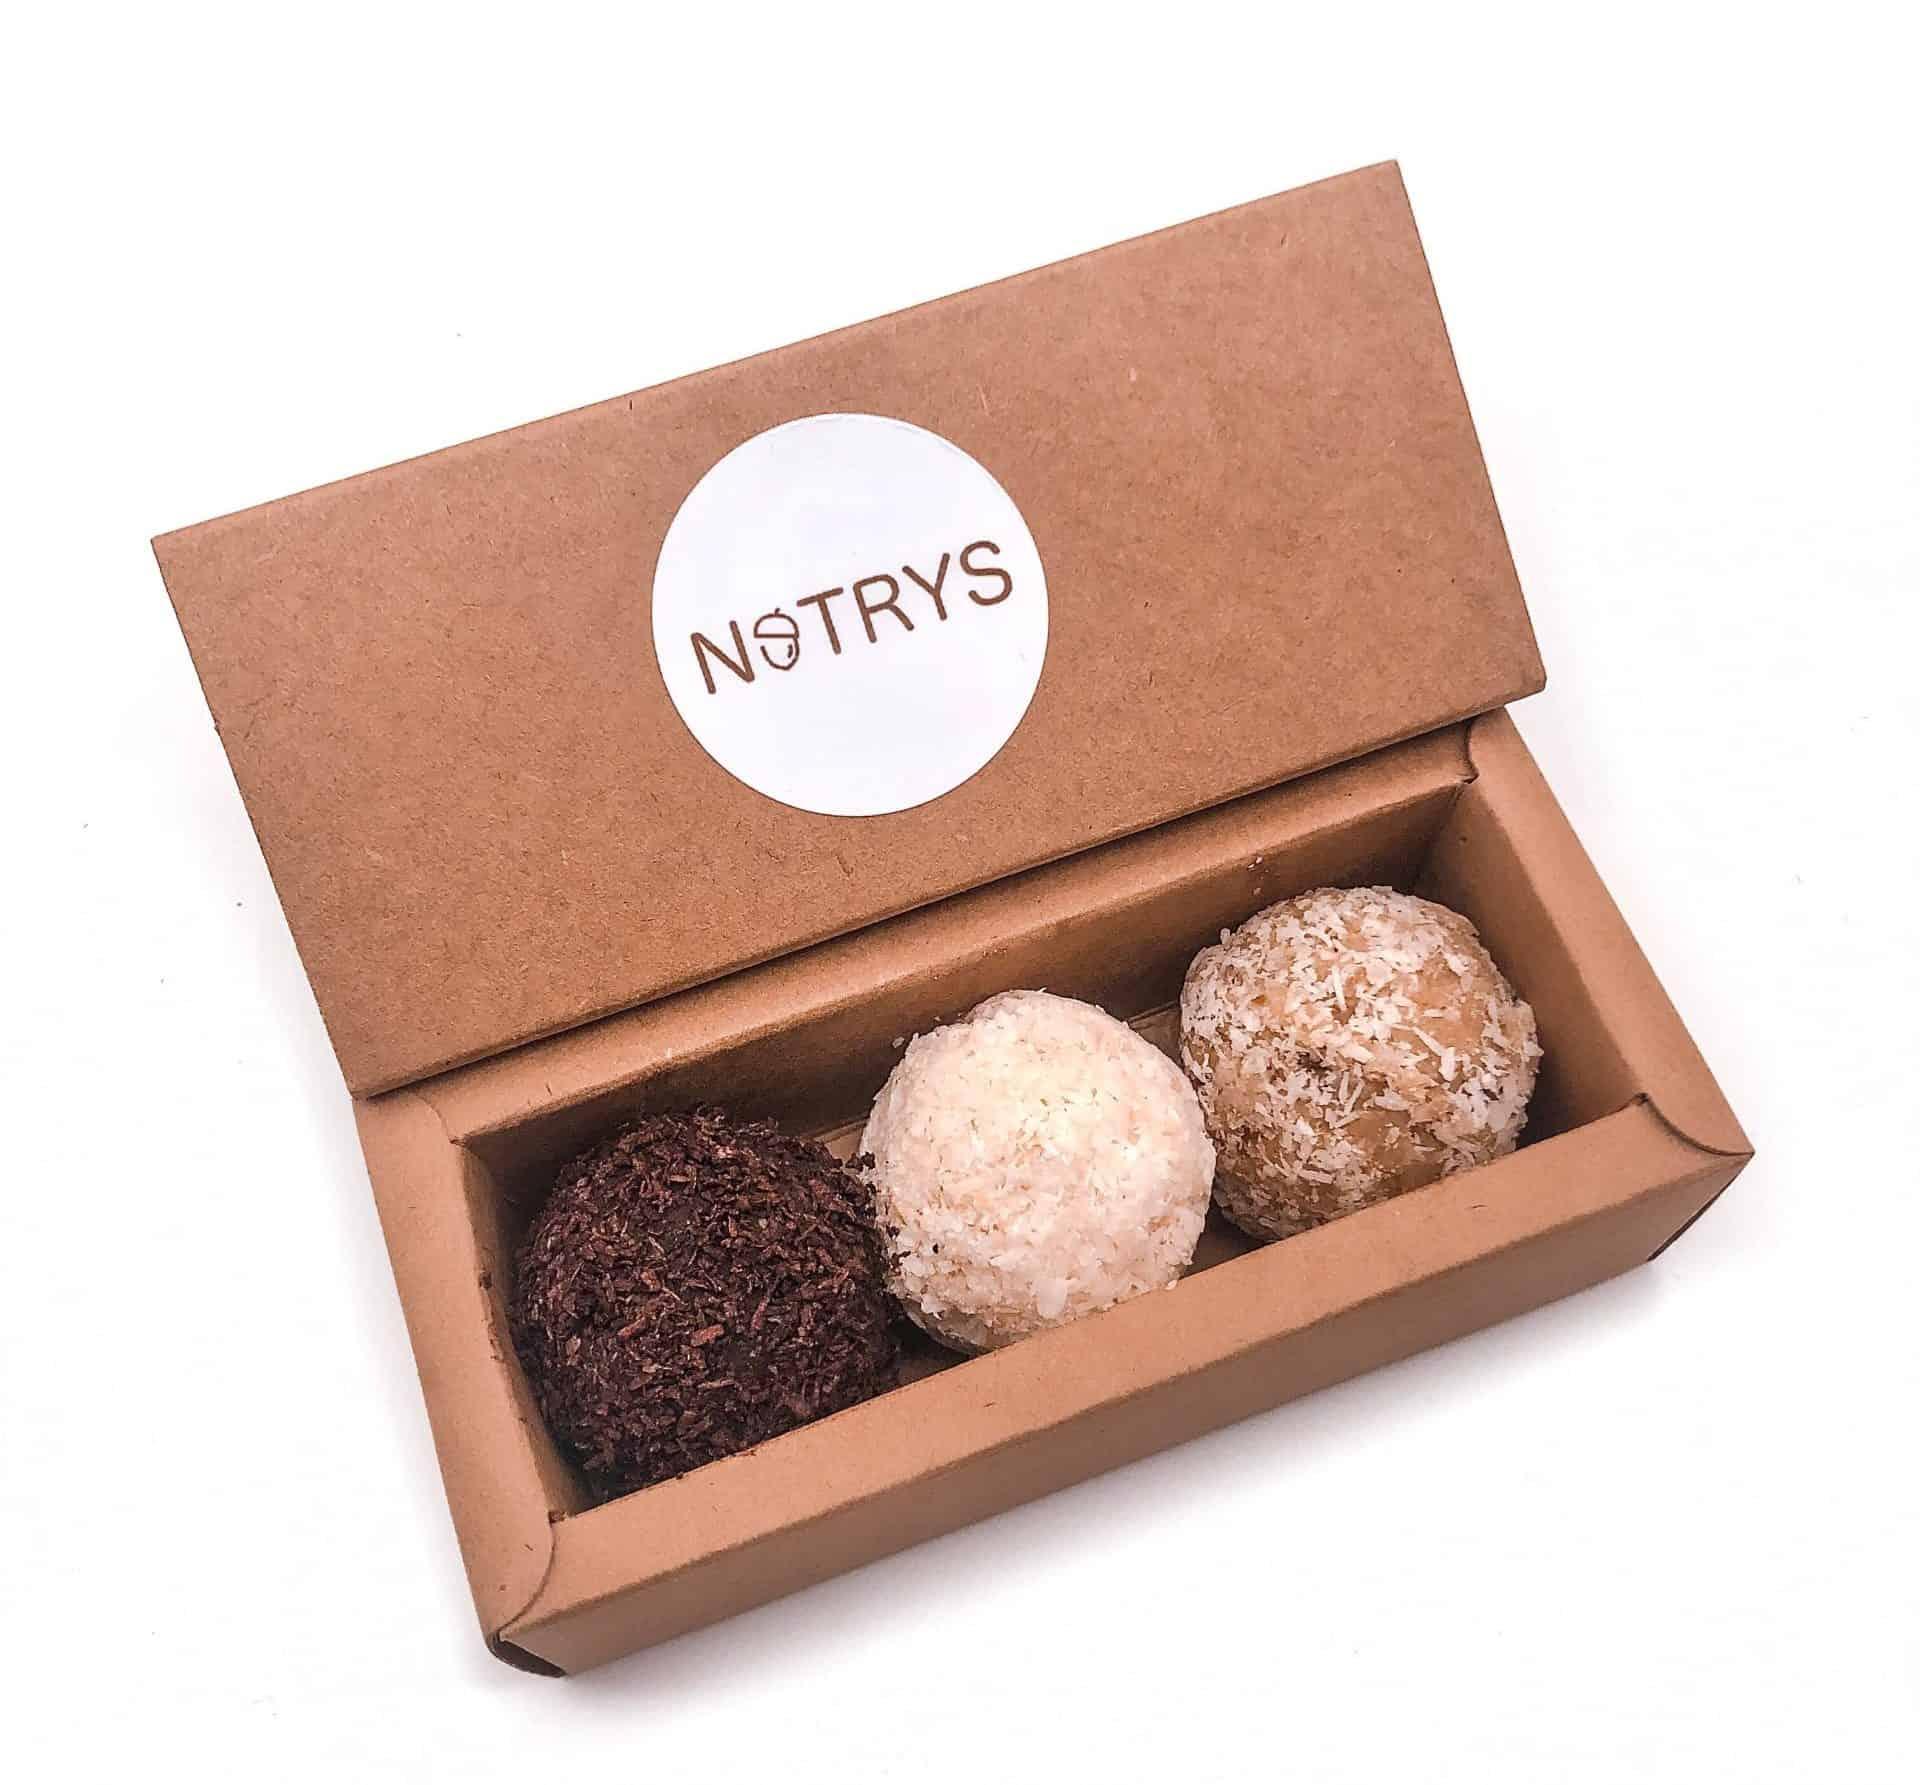 Nutrys 3er Box - Kokos, Schoko, Zitrone